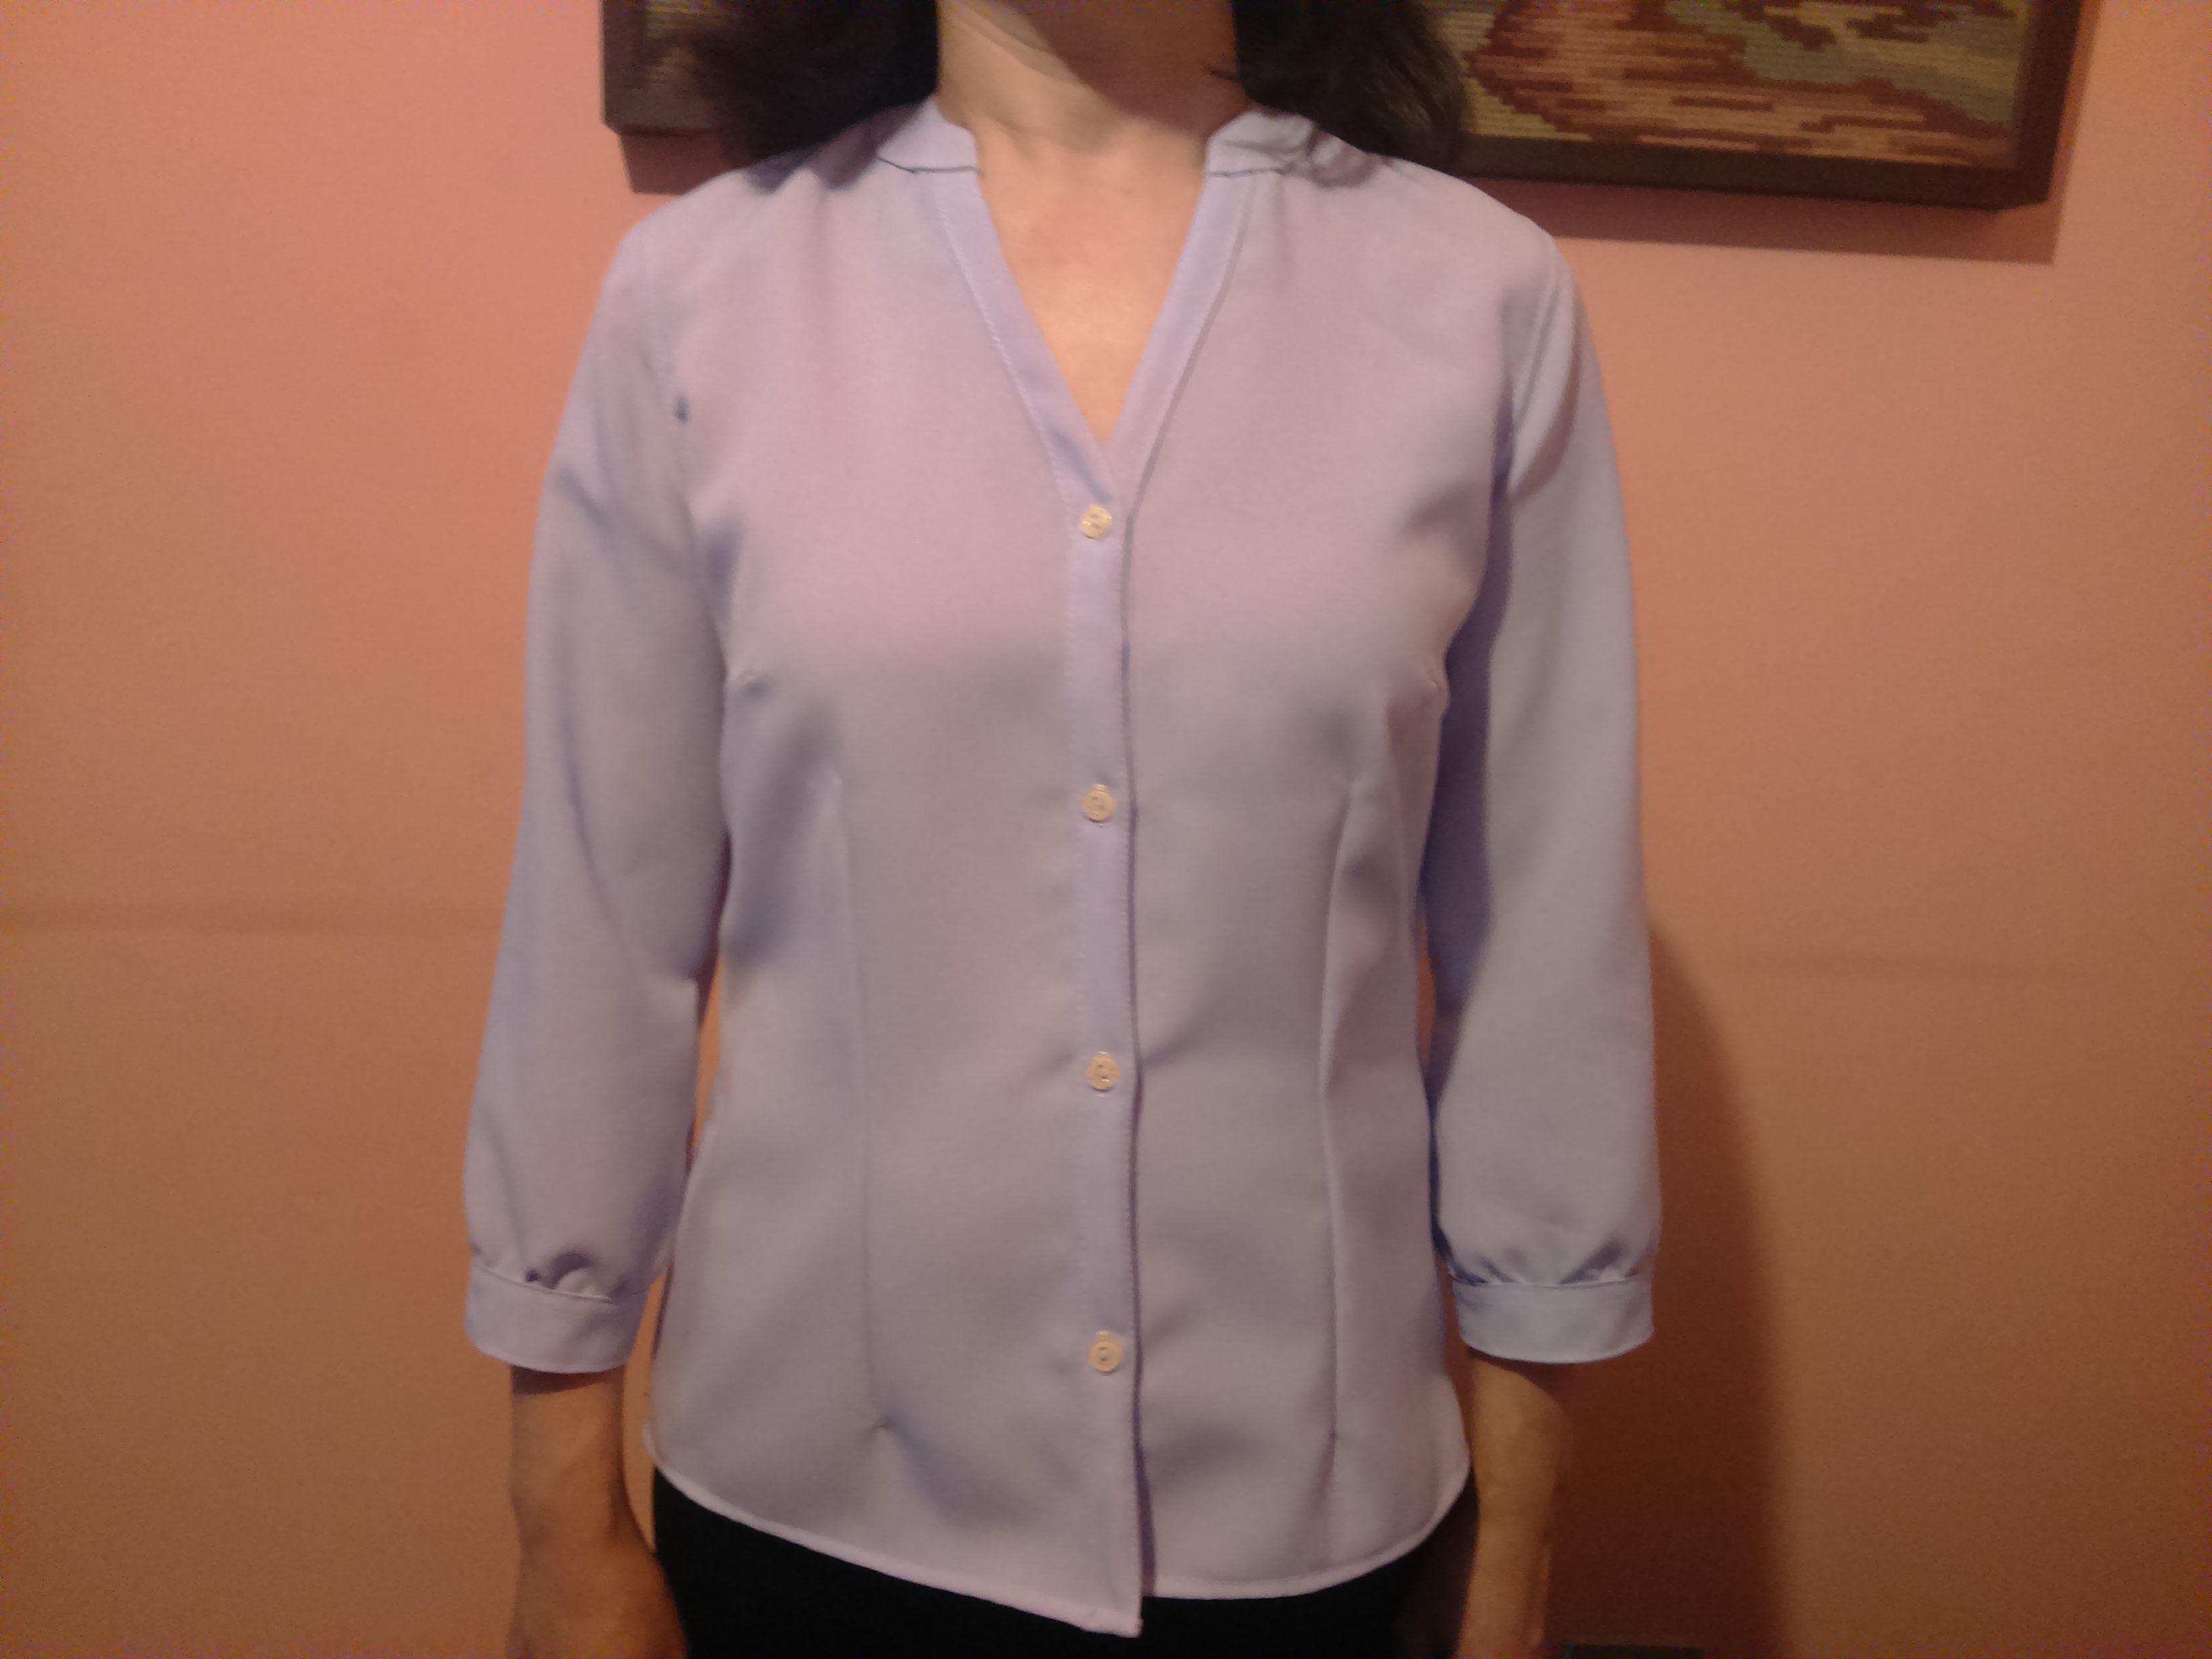 #costureicomceliaavila Camisa com gola anatômica.